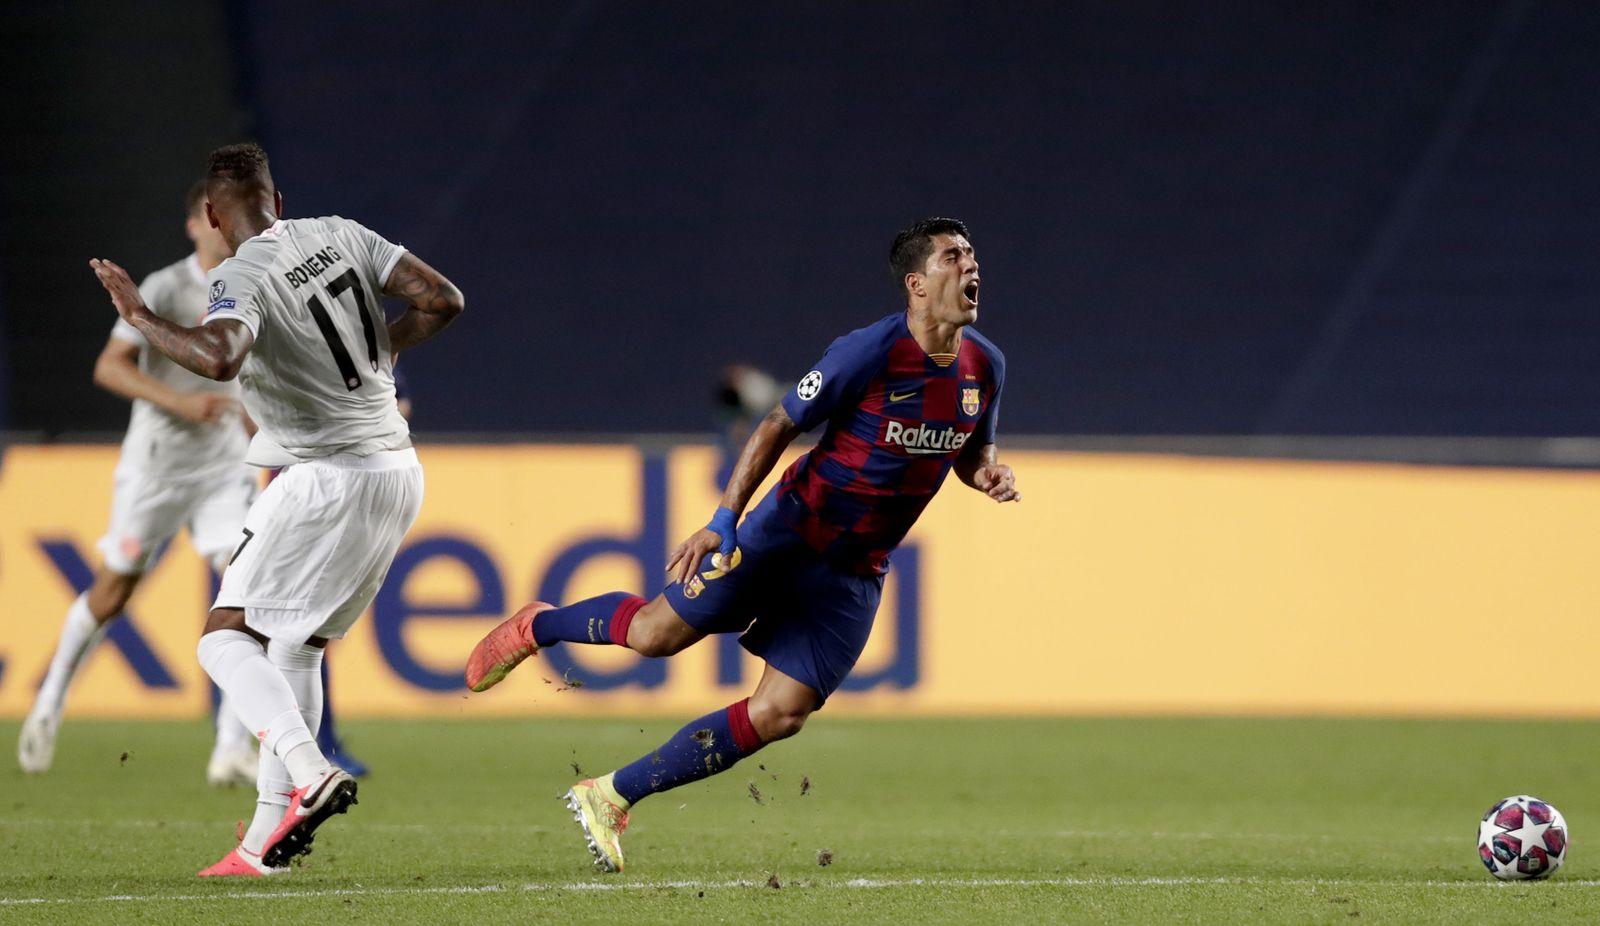 Barcelona vs Bayern Munich, Lisbon, Portugal - 14 Aug 2020